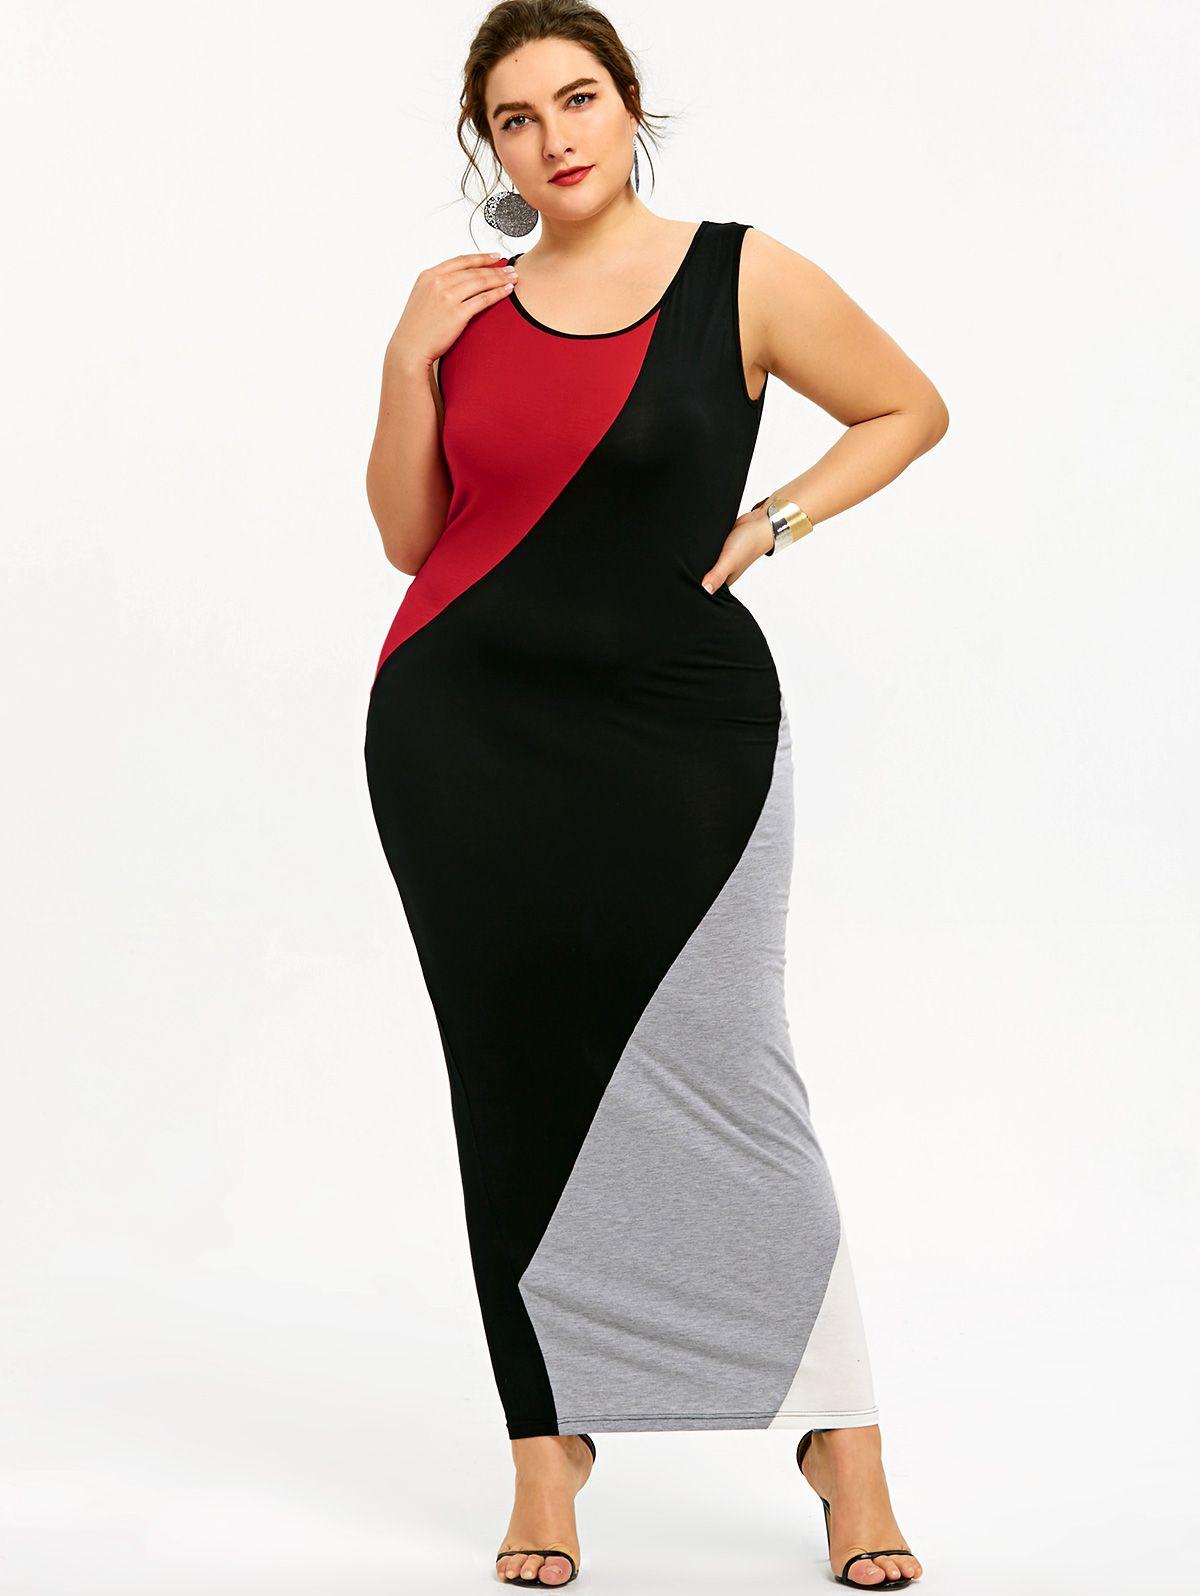 d844332c7e9 2019 Gamiss Plus Size 5XL U Neck Maxi Tank Dress Color Block Sleeveless  Women Casual Black Red White Floor Length Dress Vestidos From Cfashions